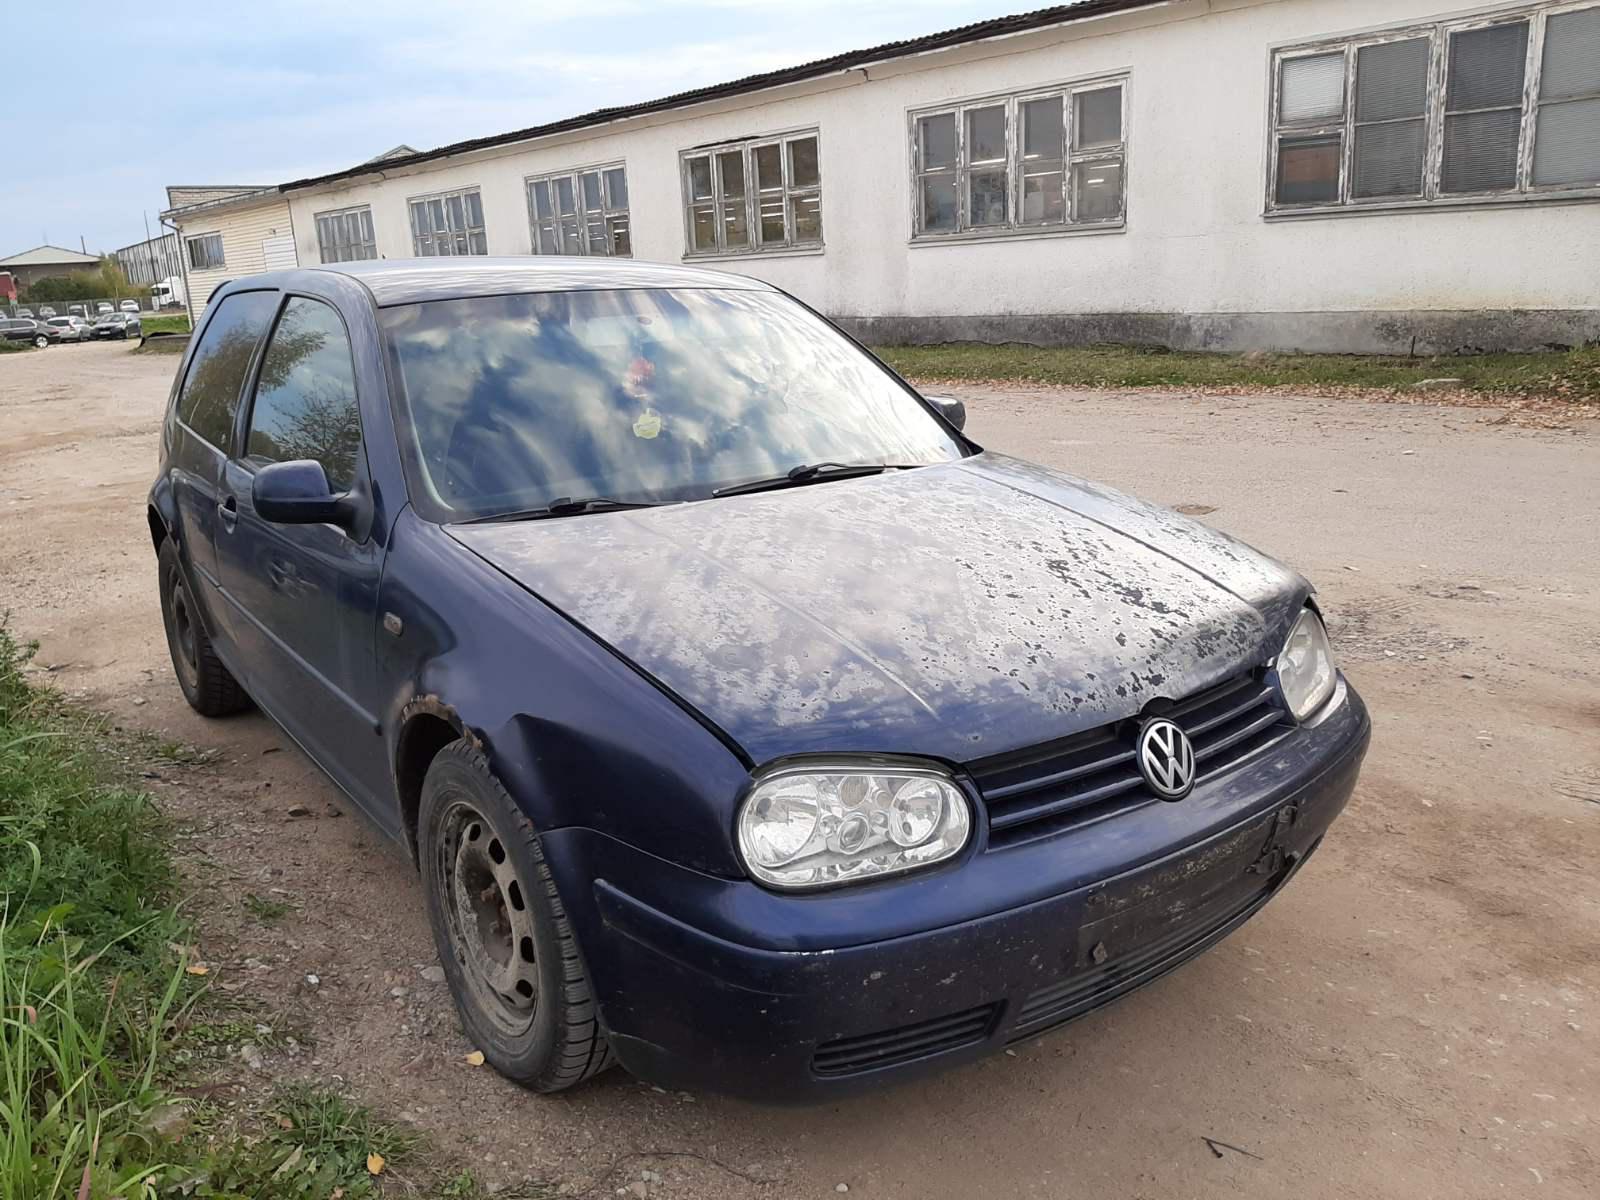 Naudotos automobilio dalys Volkswagen GOLF 2000 1.9 Mechaninė Hečbekas 2/3 d. Melyna 2021-10-04